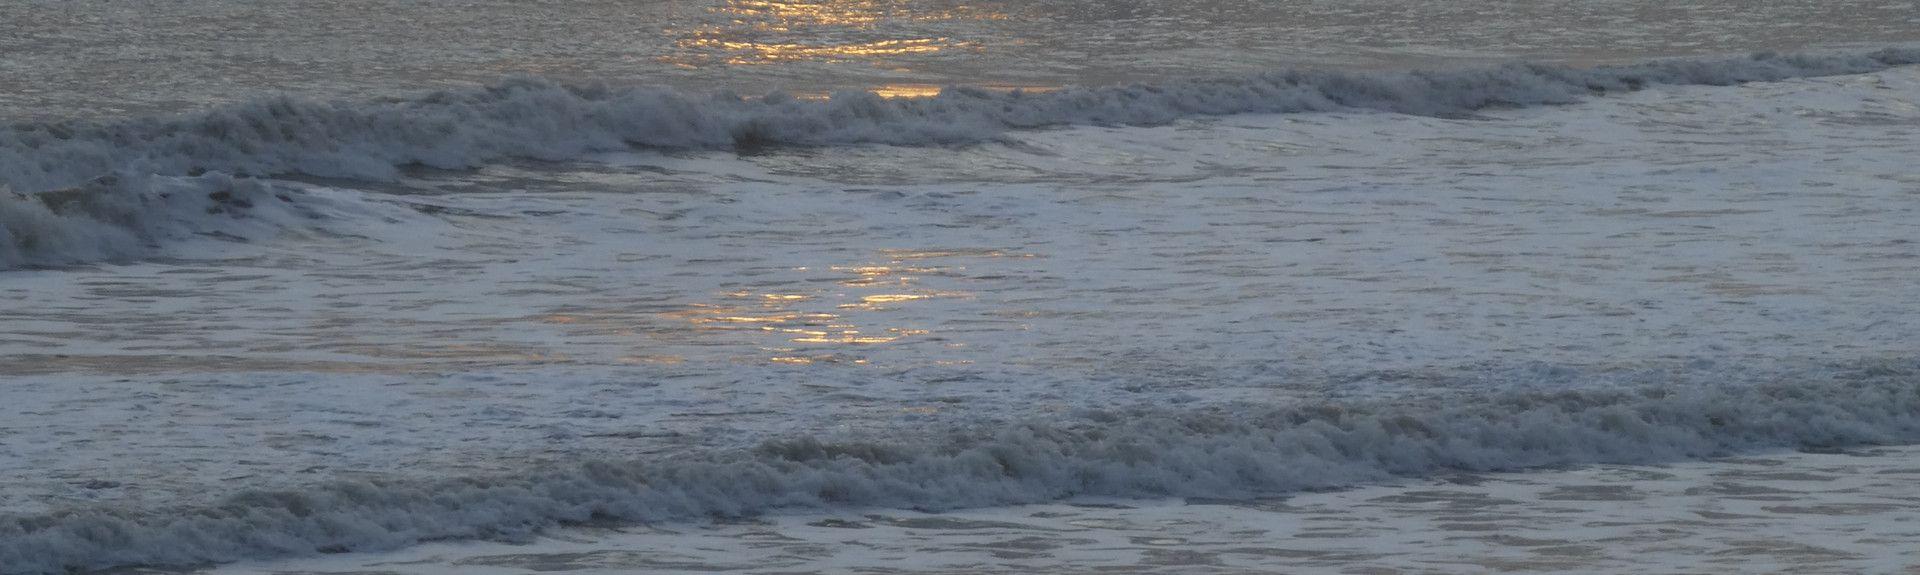 Caswell Bay Beach, Swansea, Wales, United Kingdom